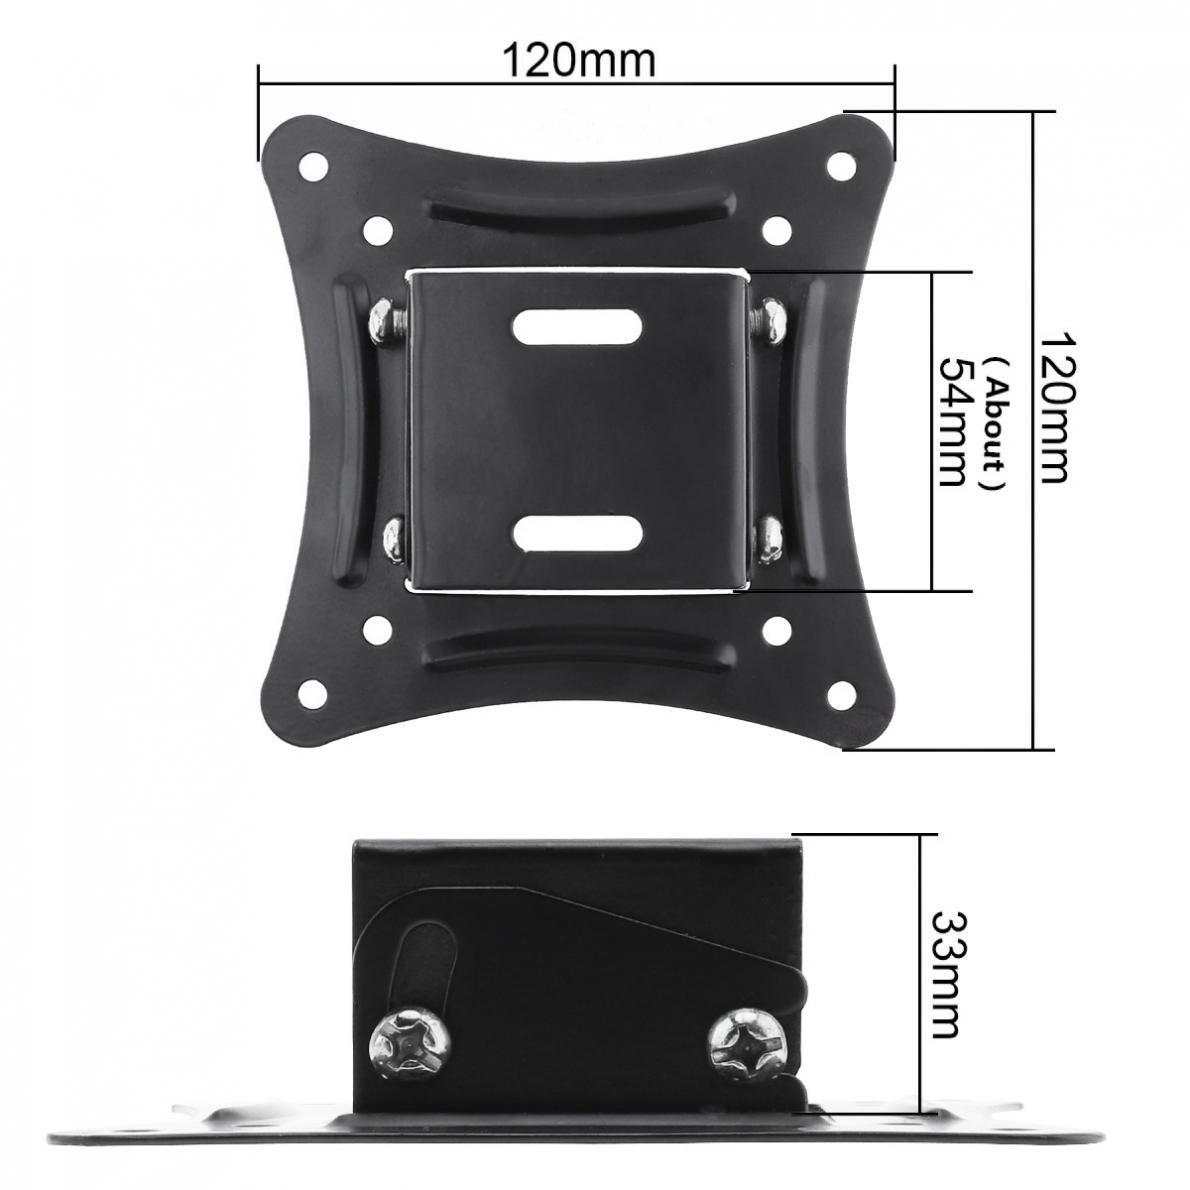 Universal 14-26 Inch LCD LED Monitor Flat Panel TV Wall Mount Bracket Fixed Flat Panel TV Frame Support 10 Degrees Tilt Angle